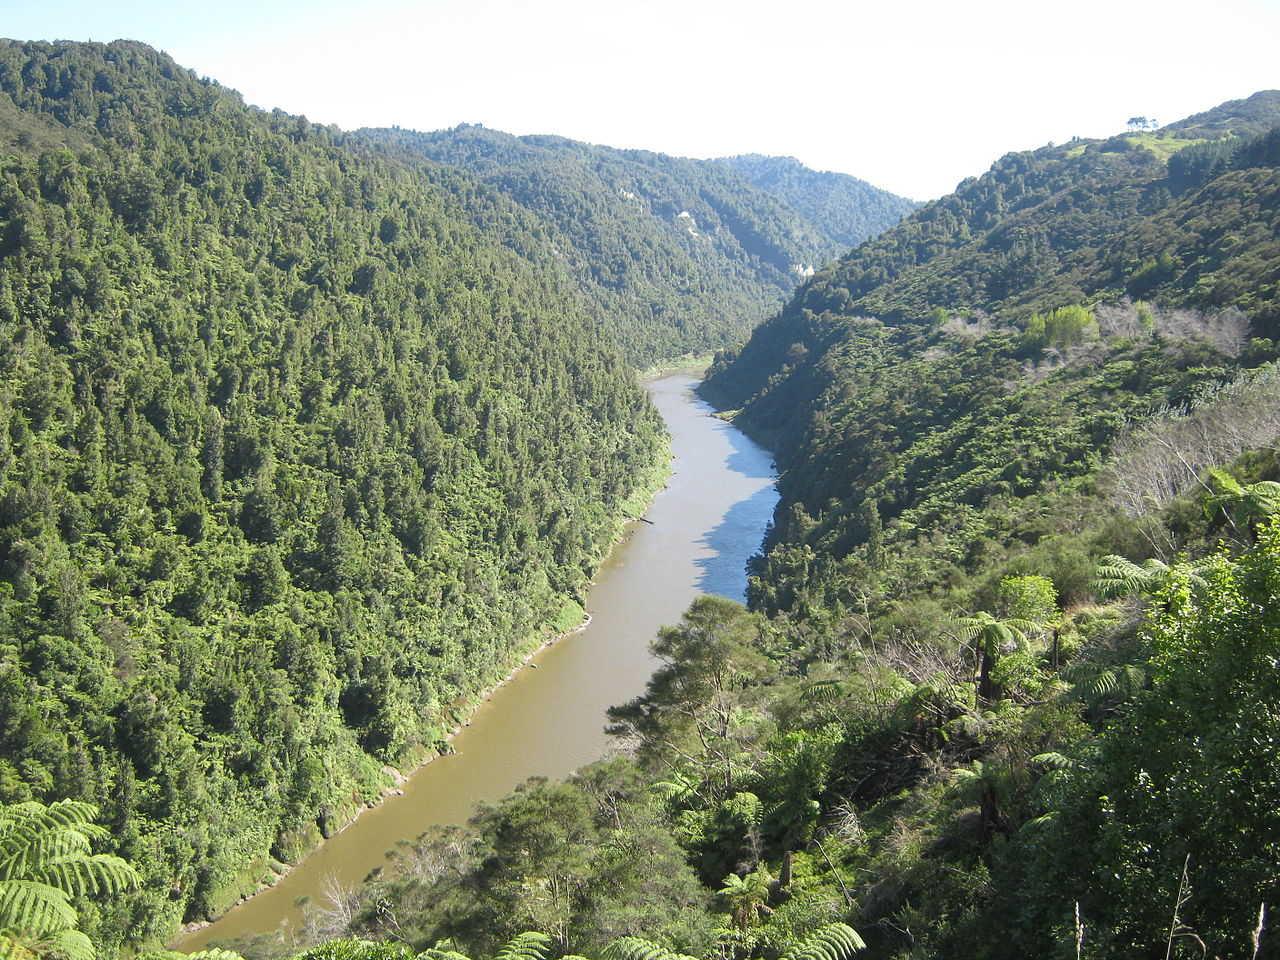 https://commons.wikimedia.org/wiki/File:Whanganui-River-01.jpg